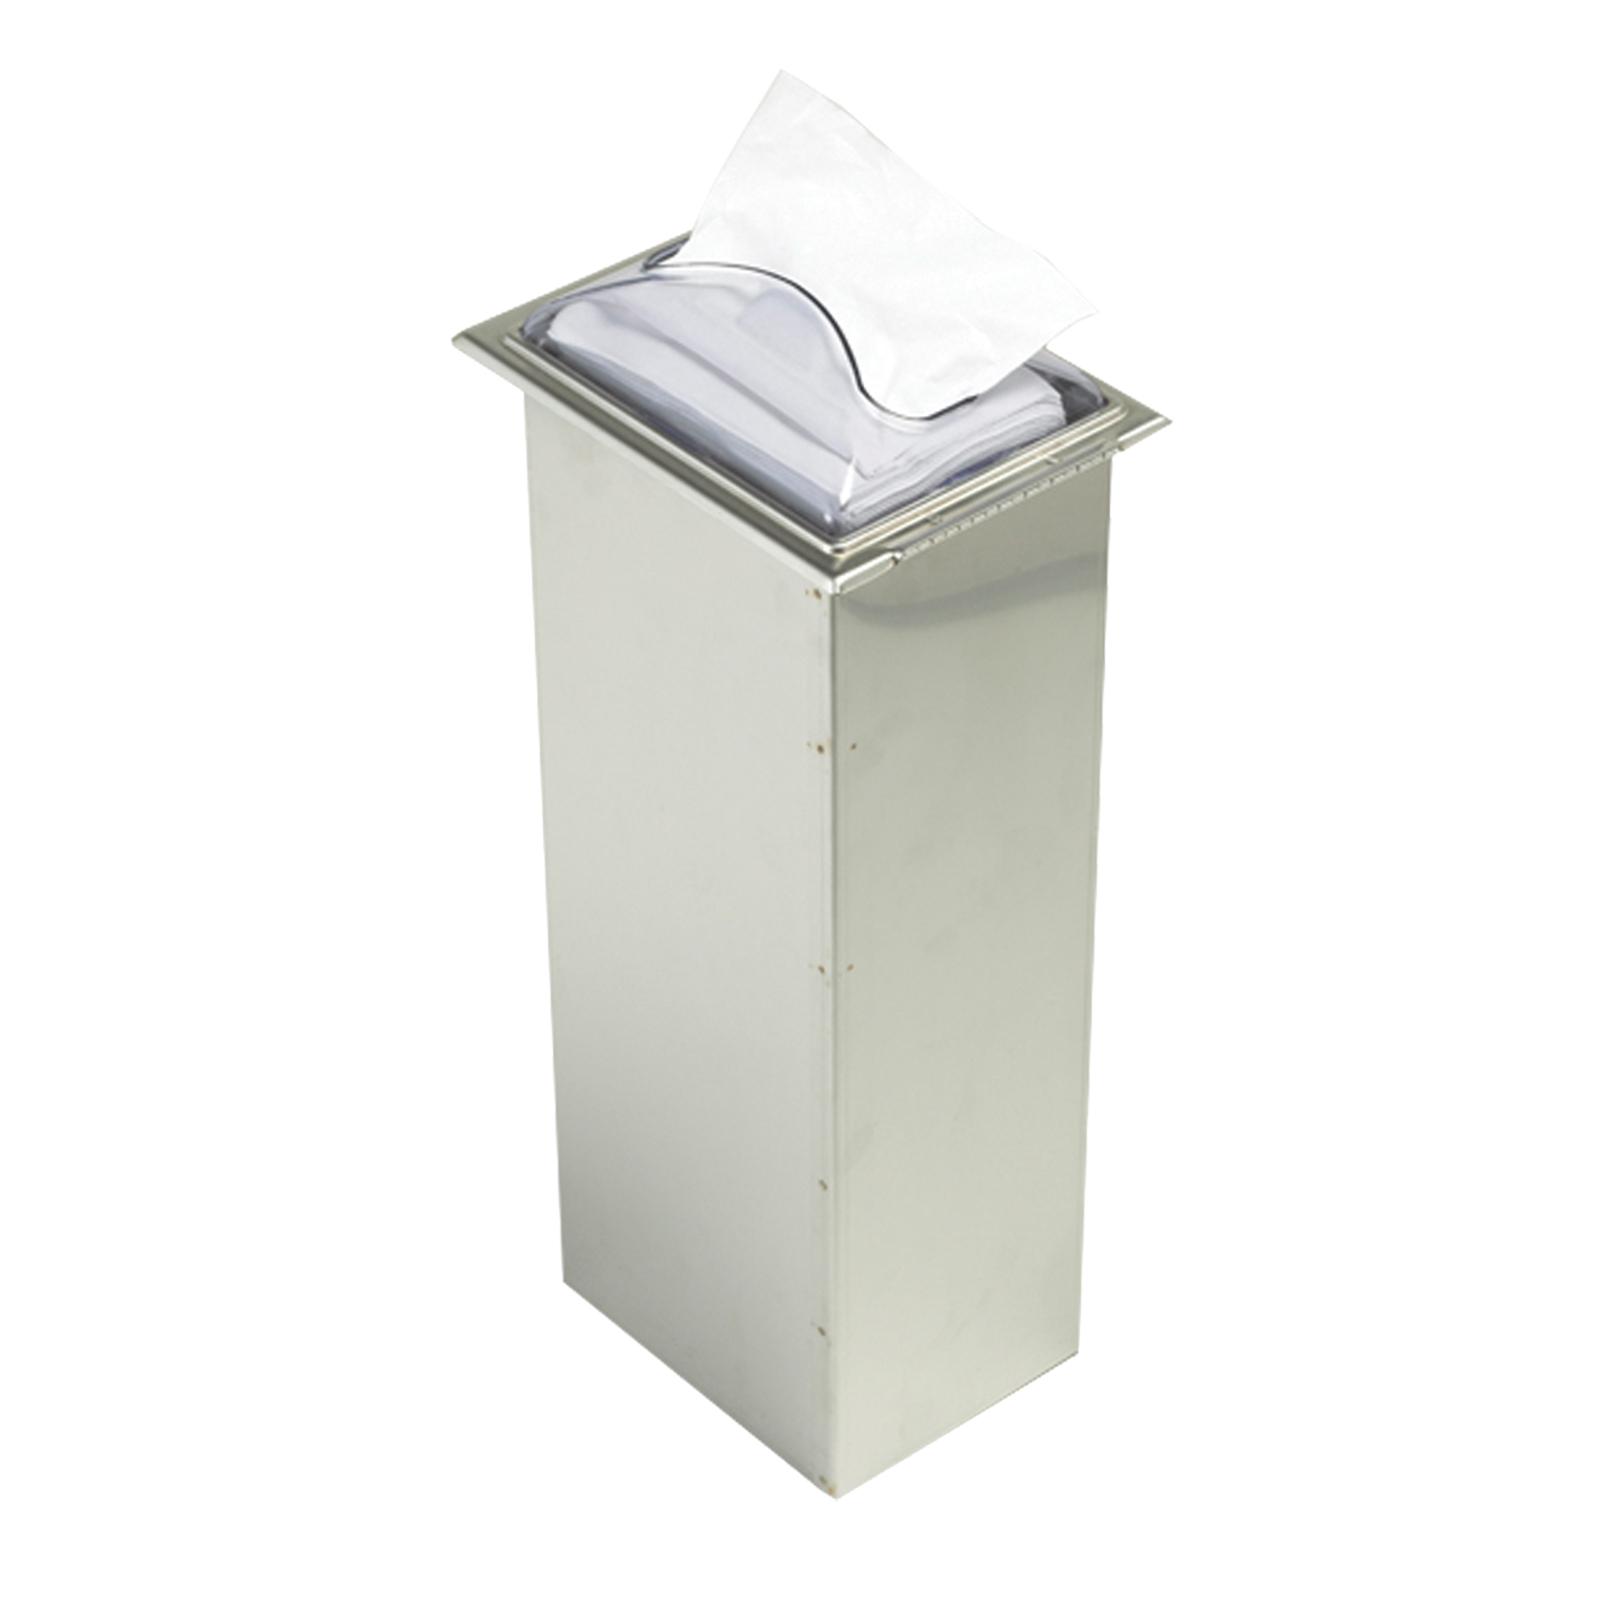 San Jamar H2003CLSS12 paper napkin dispenser